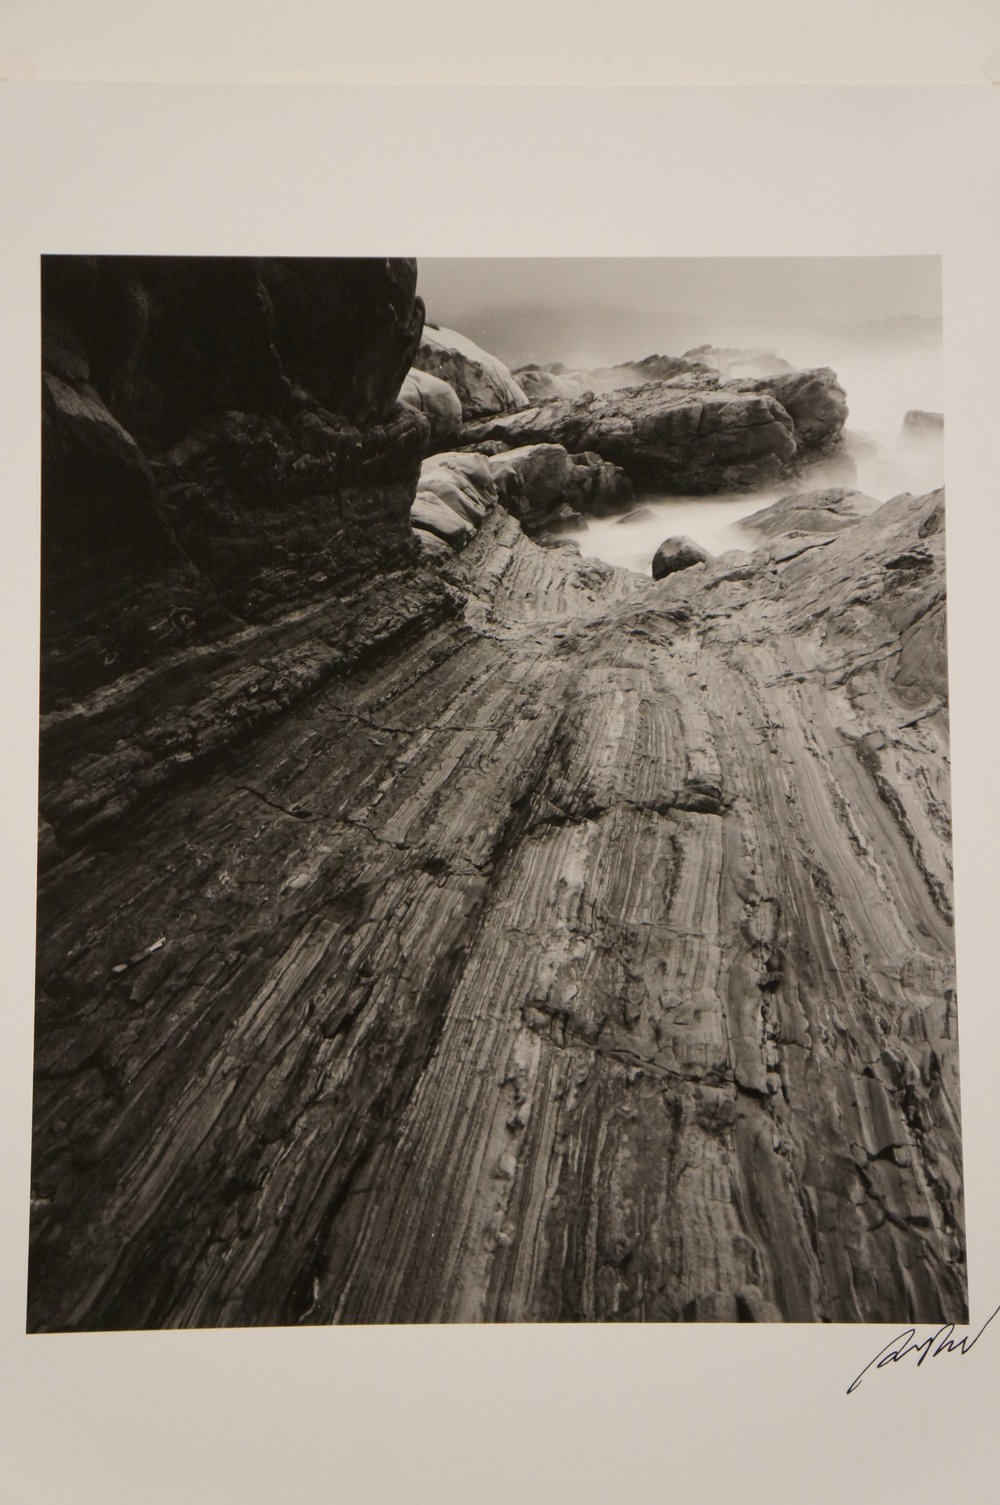 Glenn Rand, Point Lobos, gelatin silver print, 2002, 2010.2.1